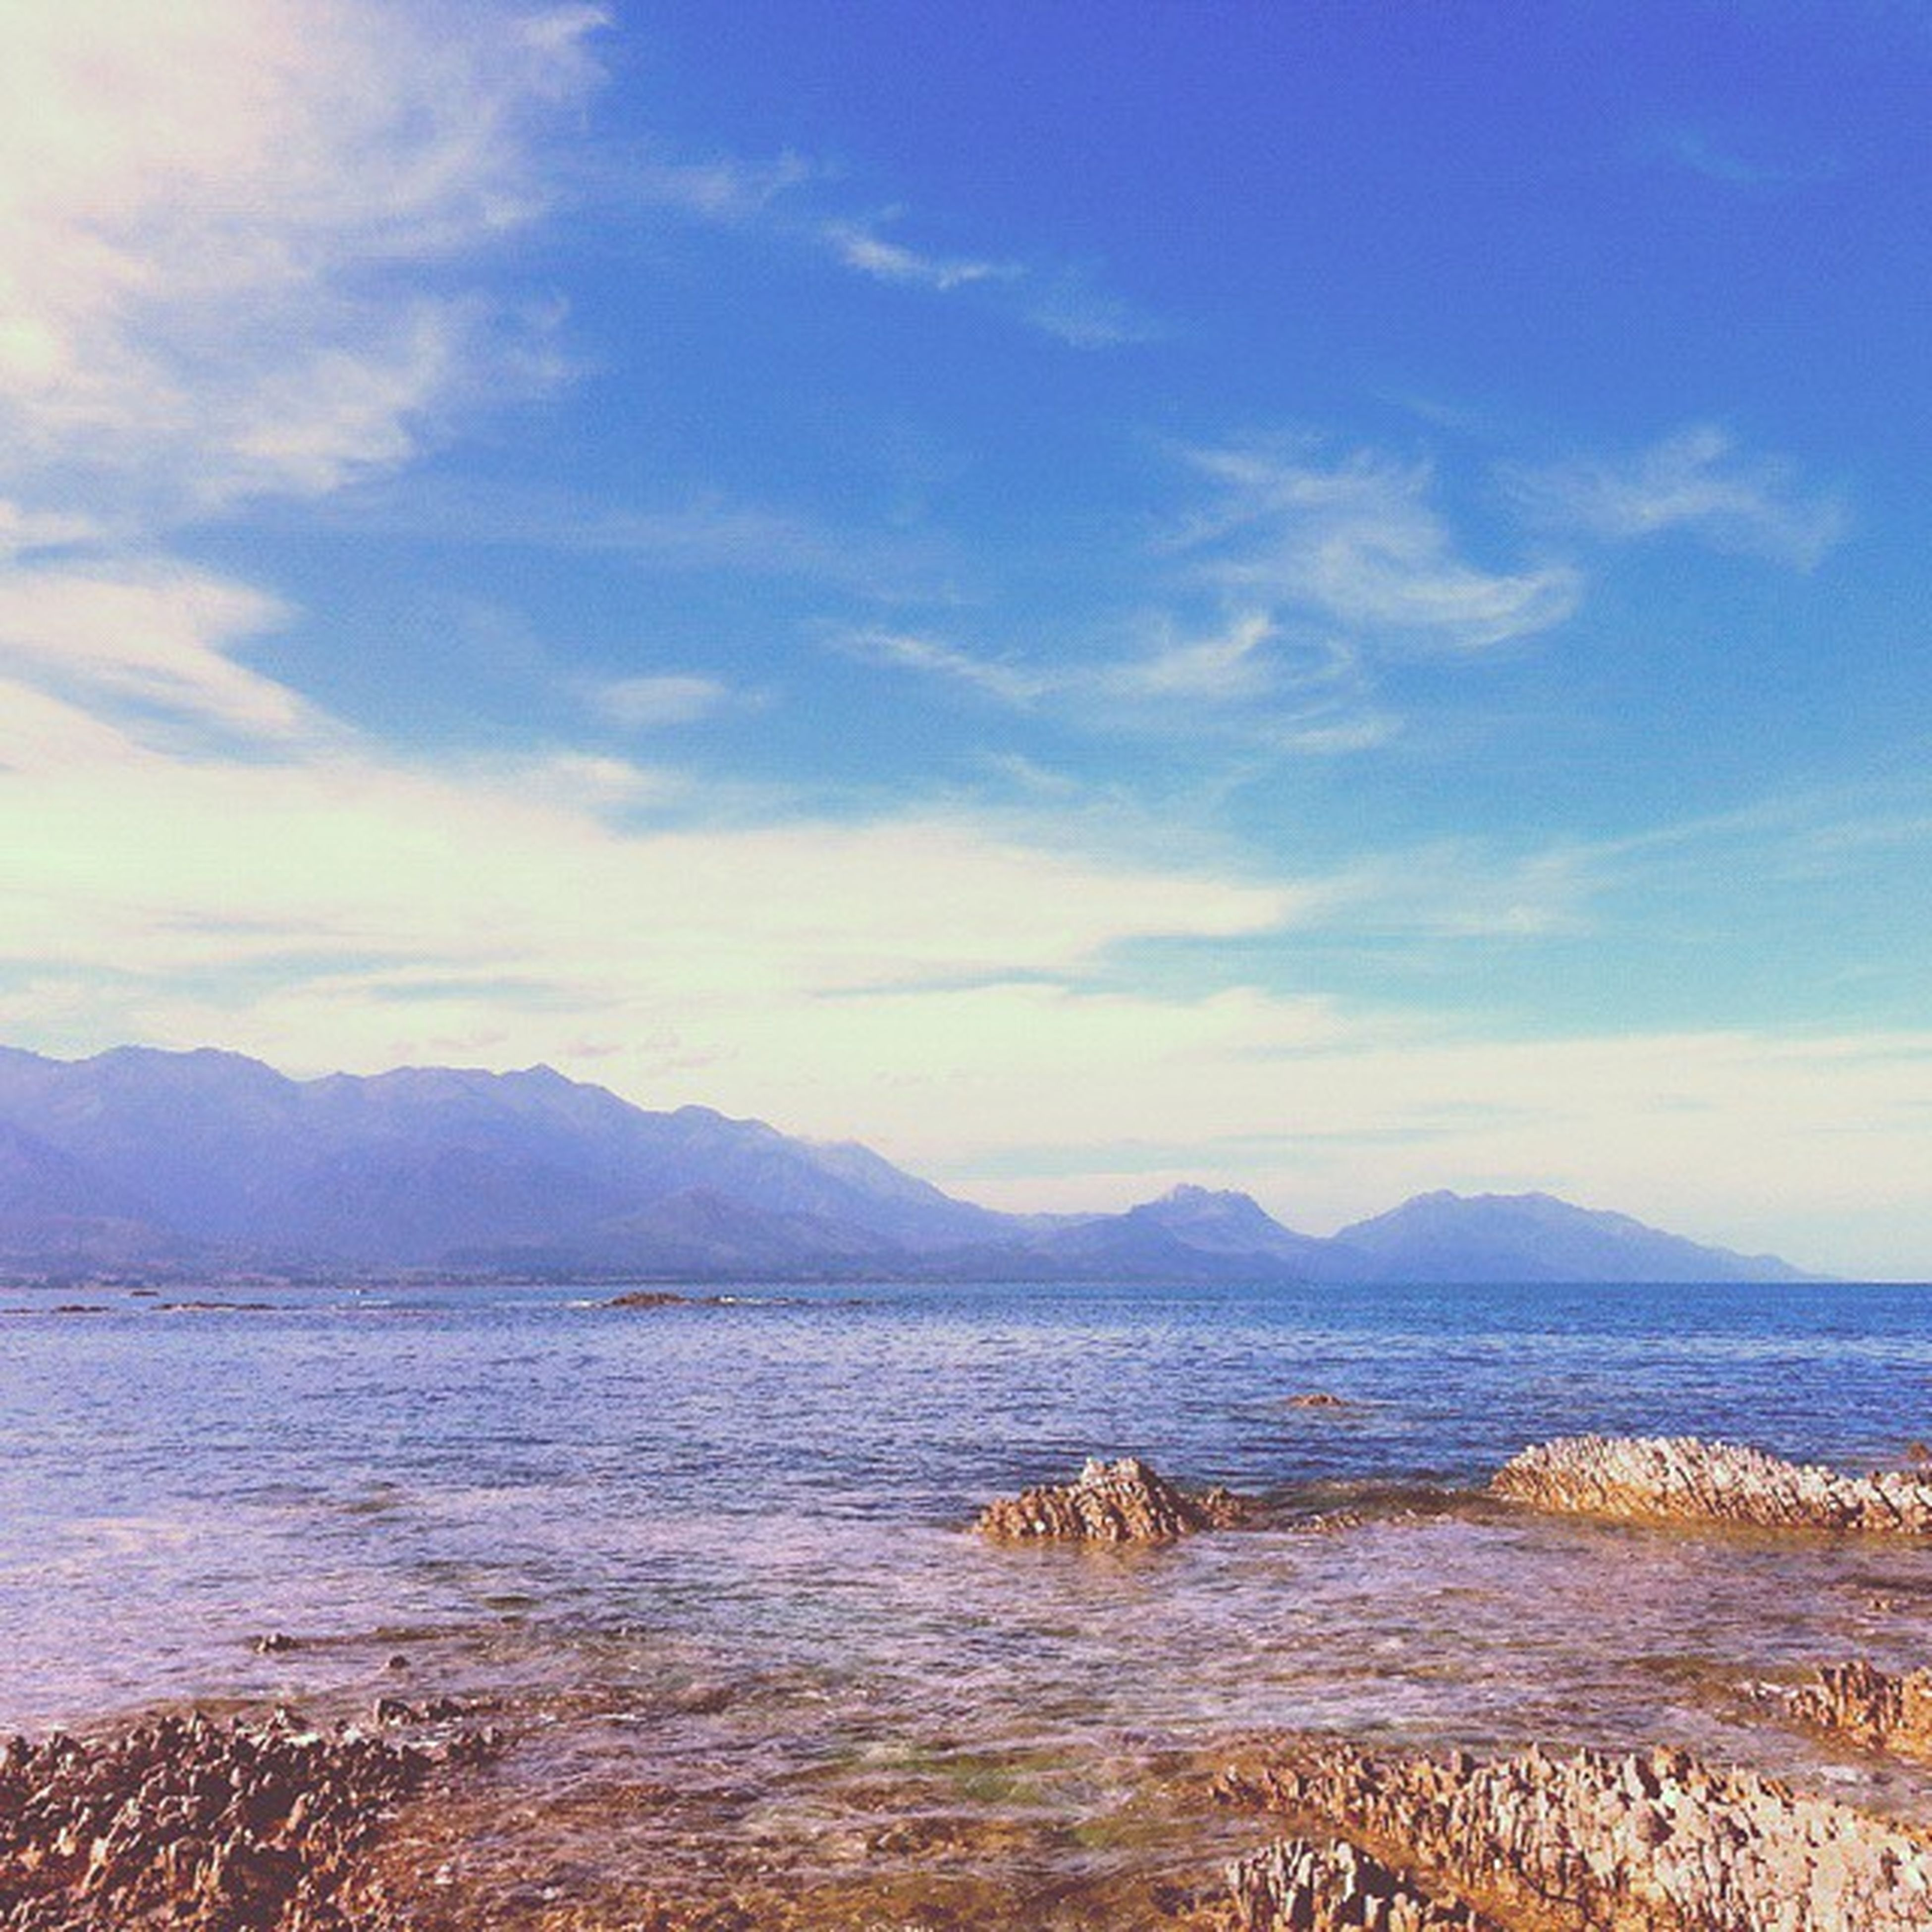 mountain, water, scenics, sea, sky, tranquil scene, tranquility, beauty in nature, mountain range, beach, cloud - sky, nature, shore, idyllic, cloud, coastline, sand, outdoors, non-urban scene, remote